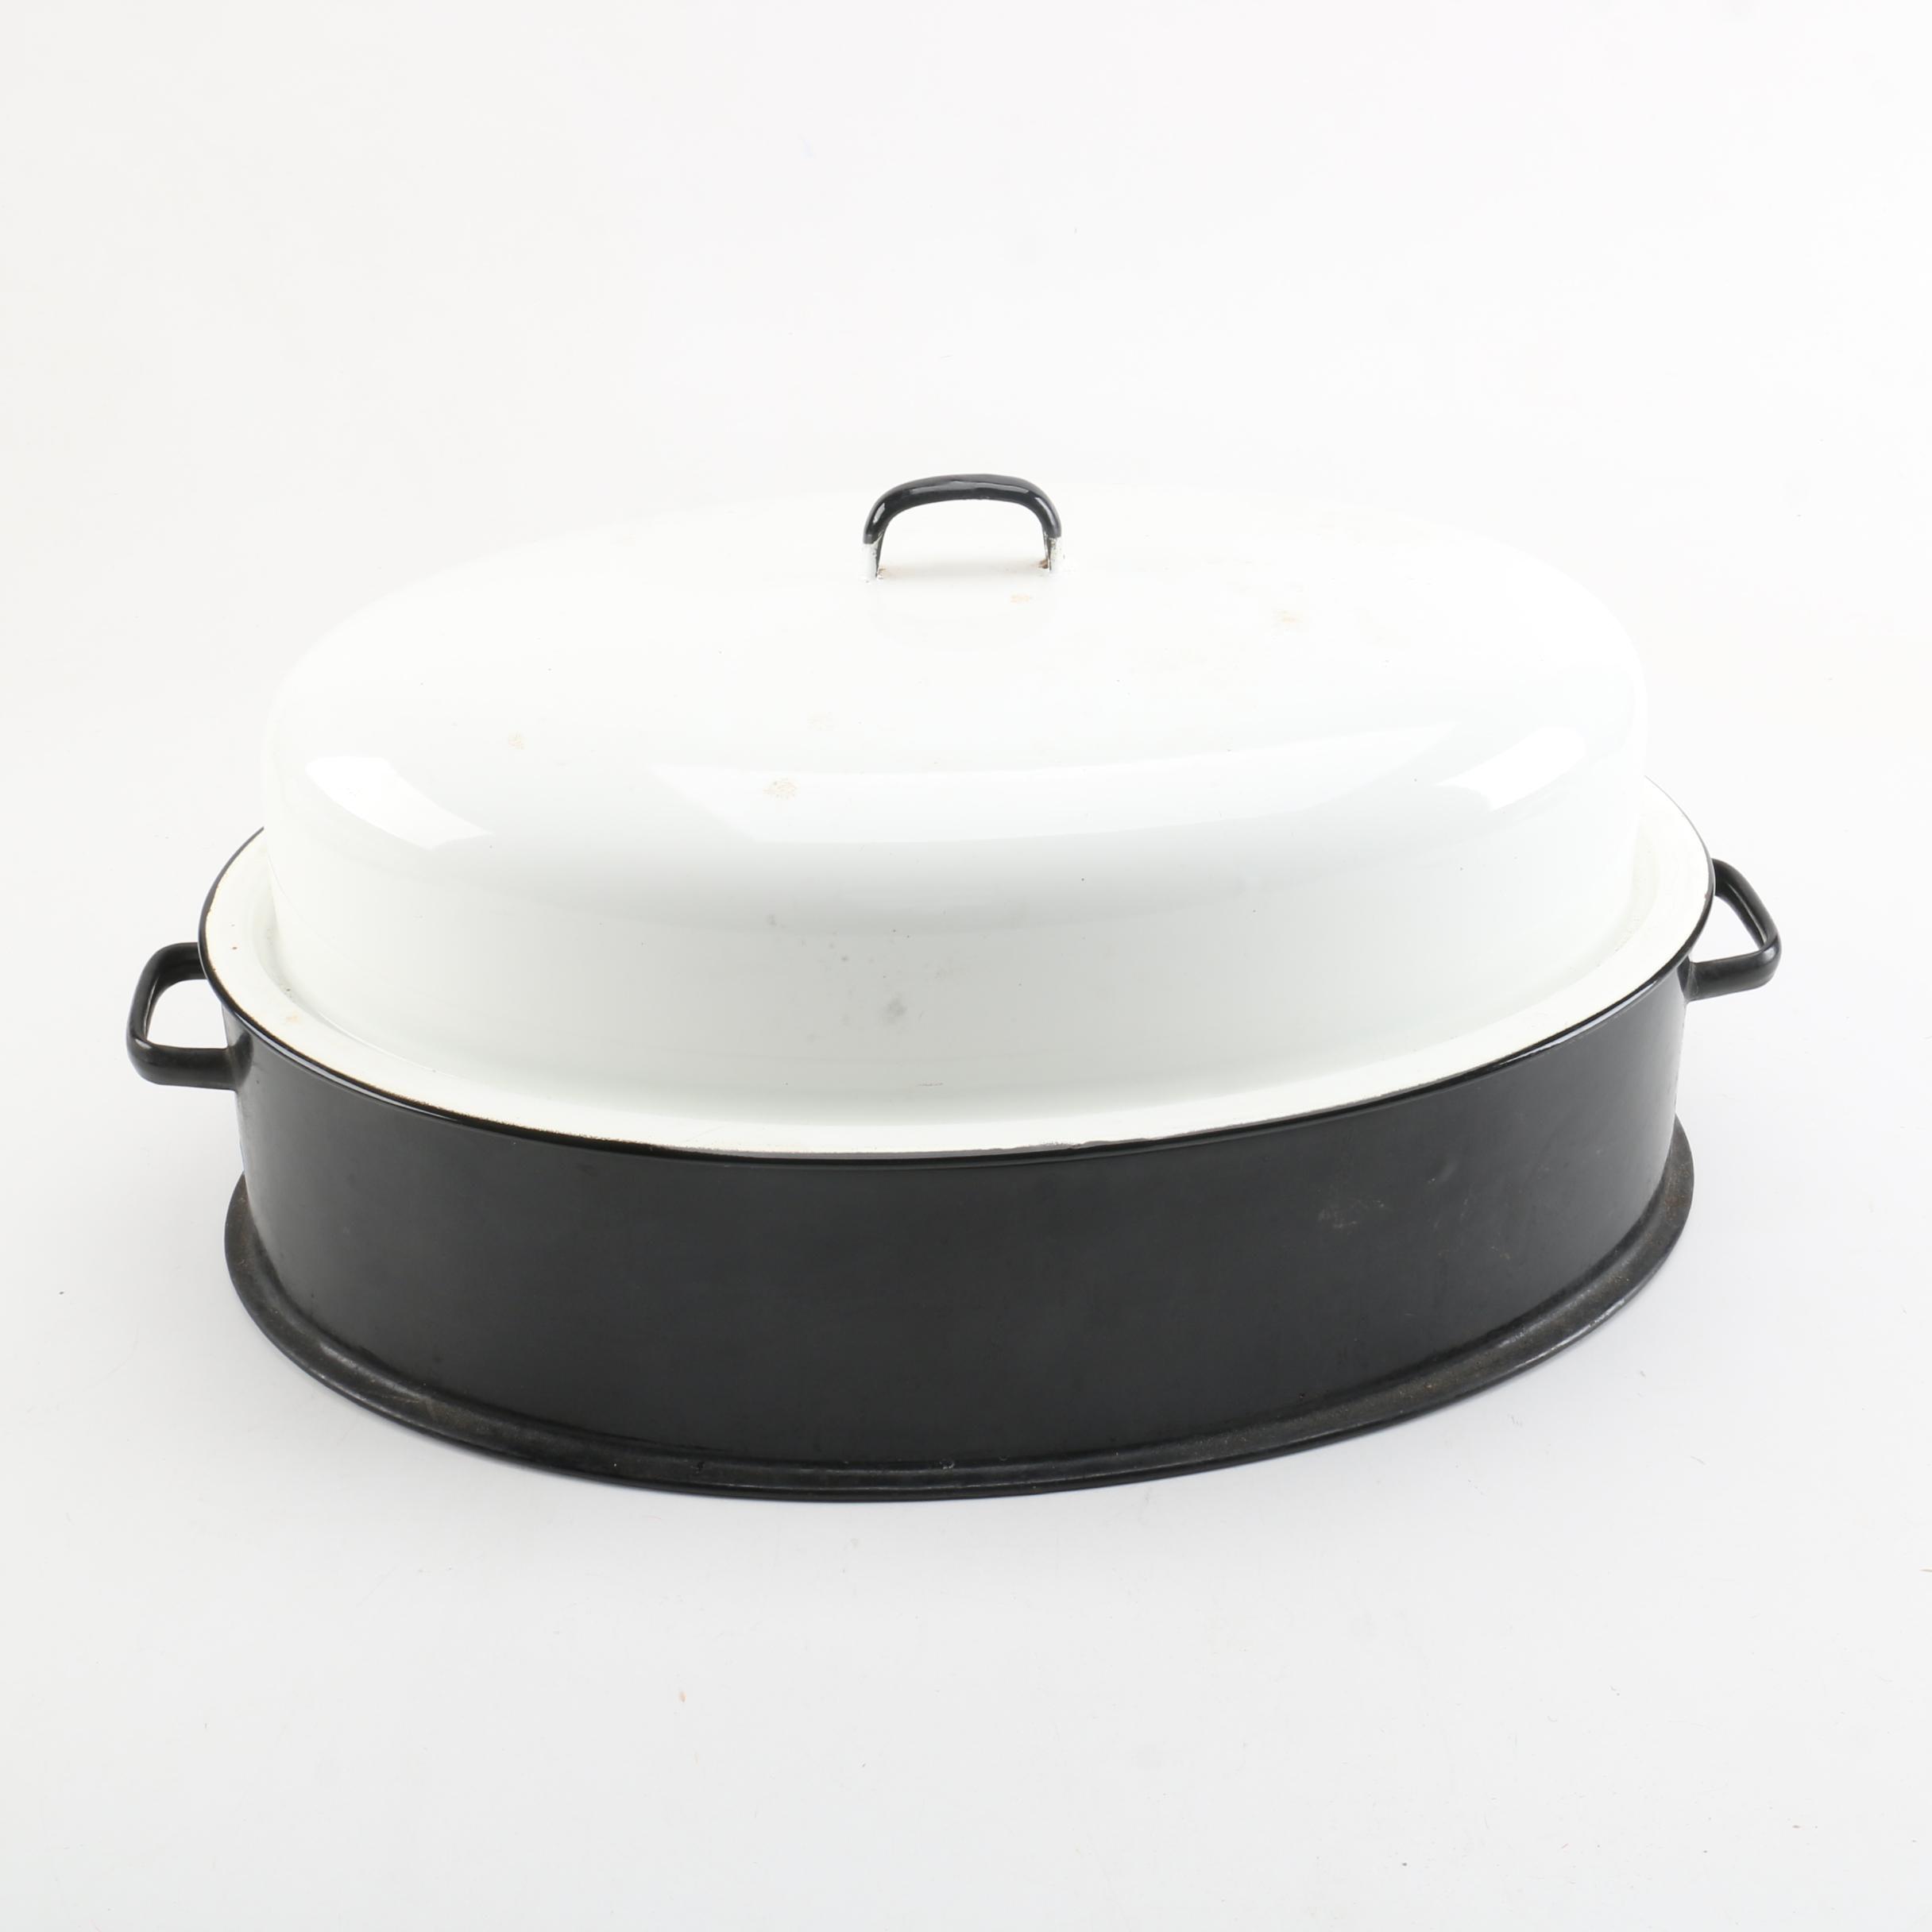 Vintage Black and White Enamelware Turkey Roaster